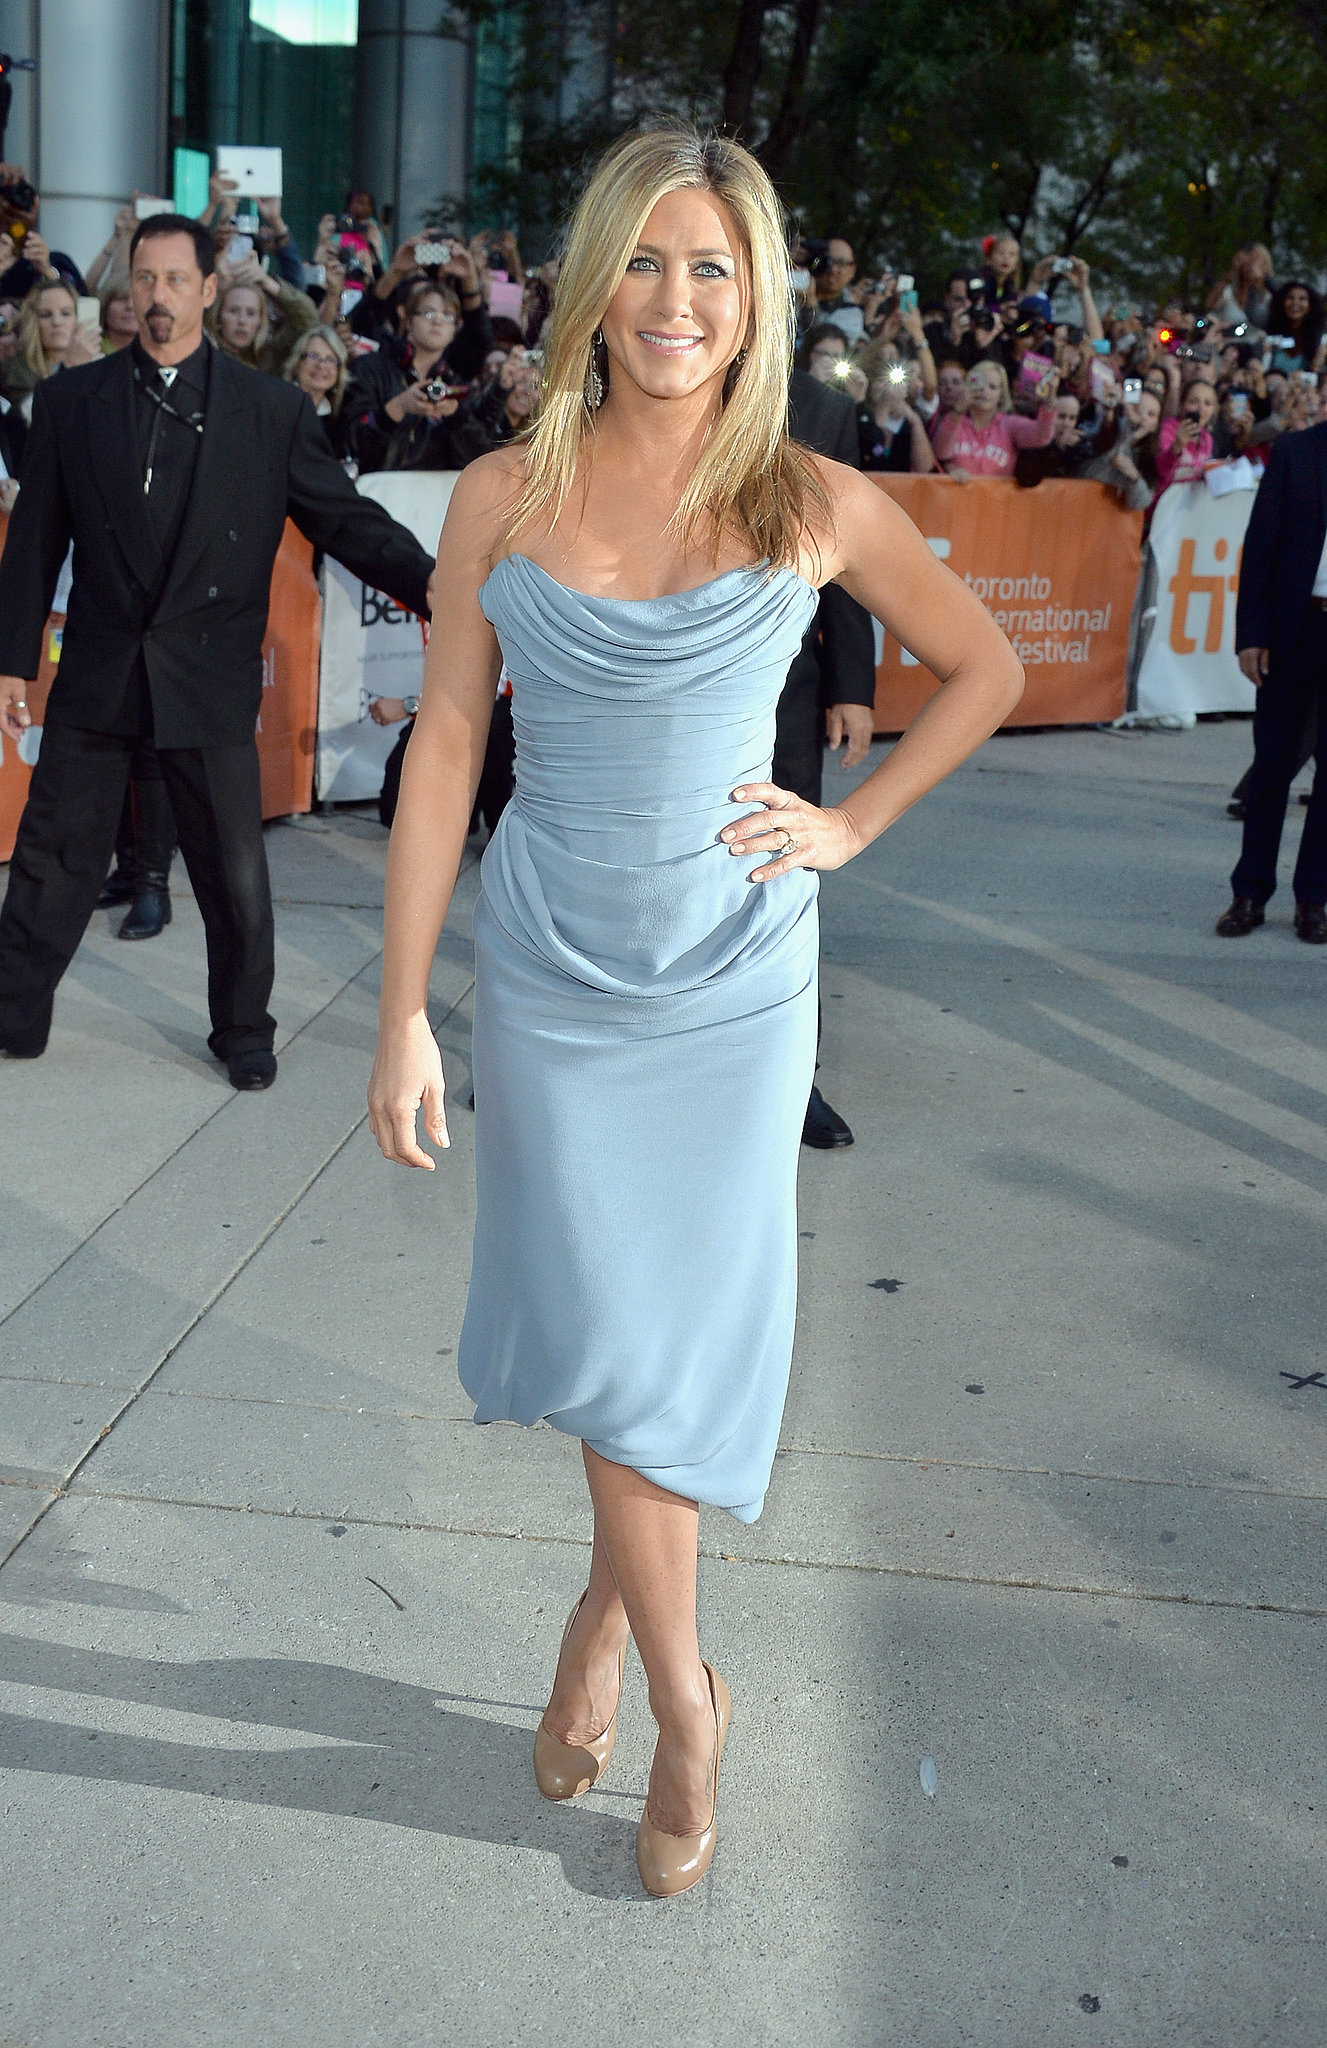 Jennifer Aniston premiered her film Life of Crime at the Toronto International Film Festival.